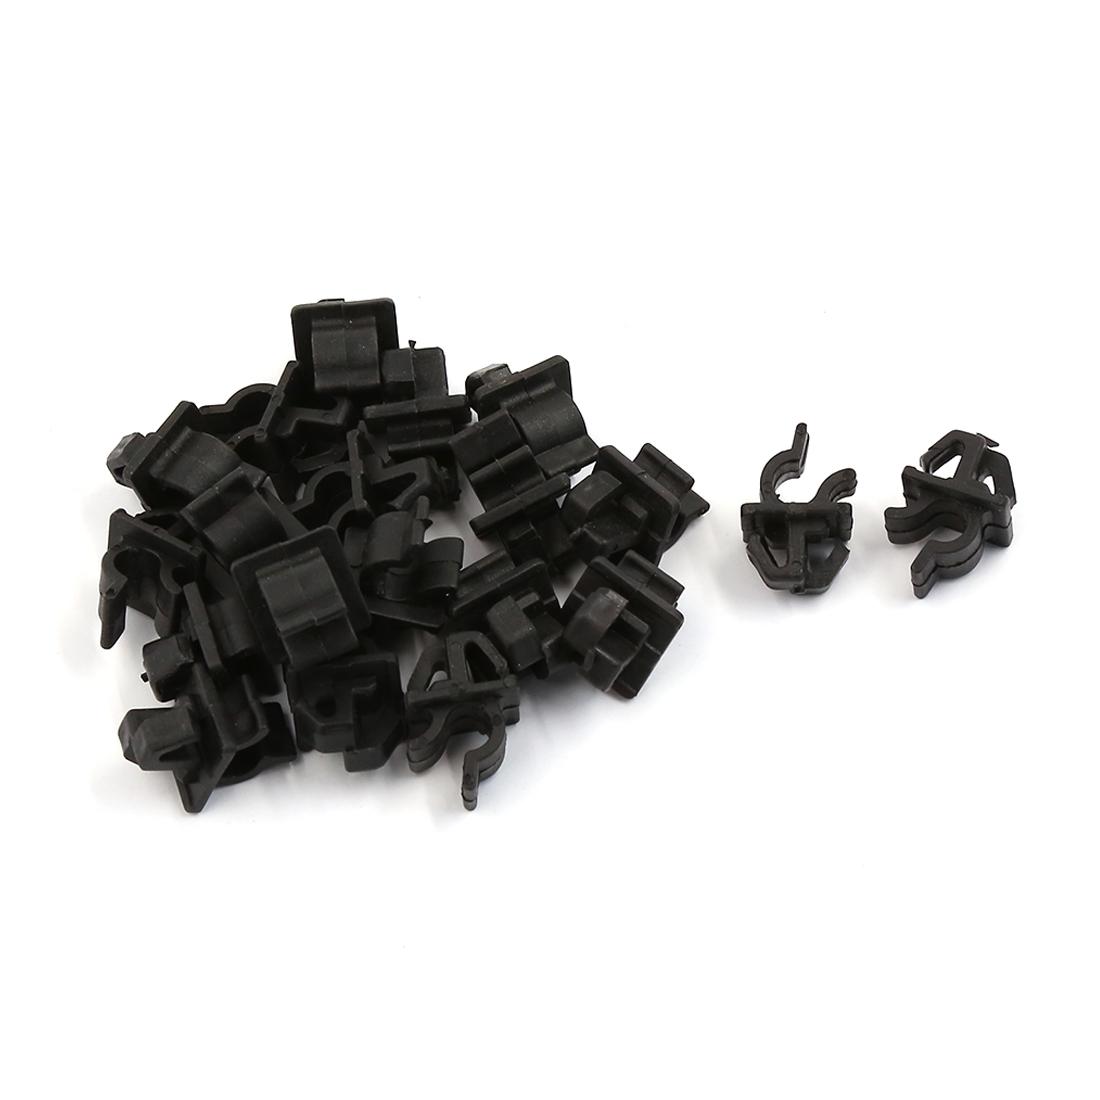 20 Pcs Black Plastic Engine Bracket Fastener Mat Rivet Clips